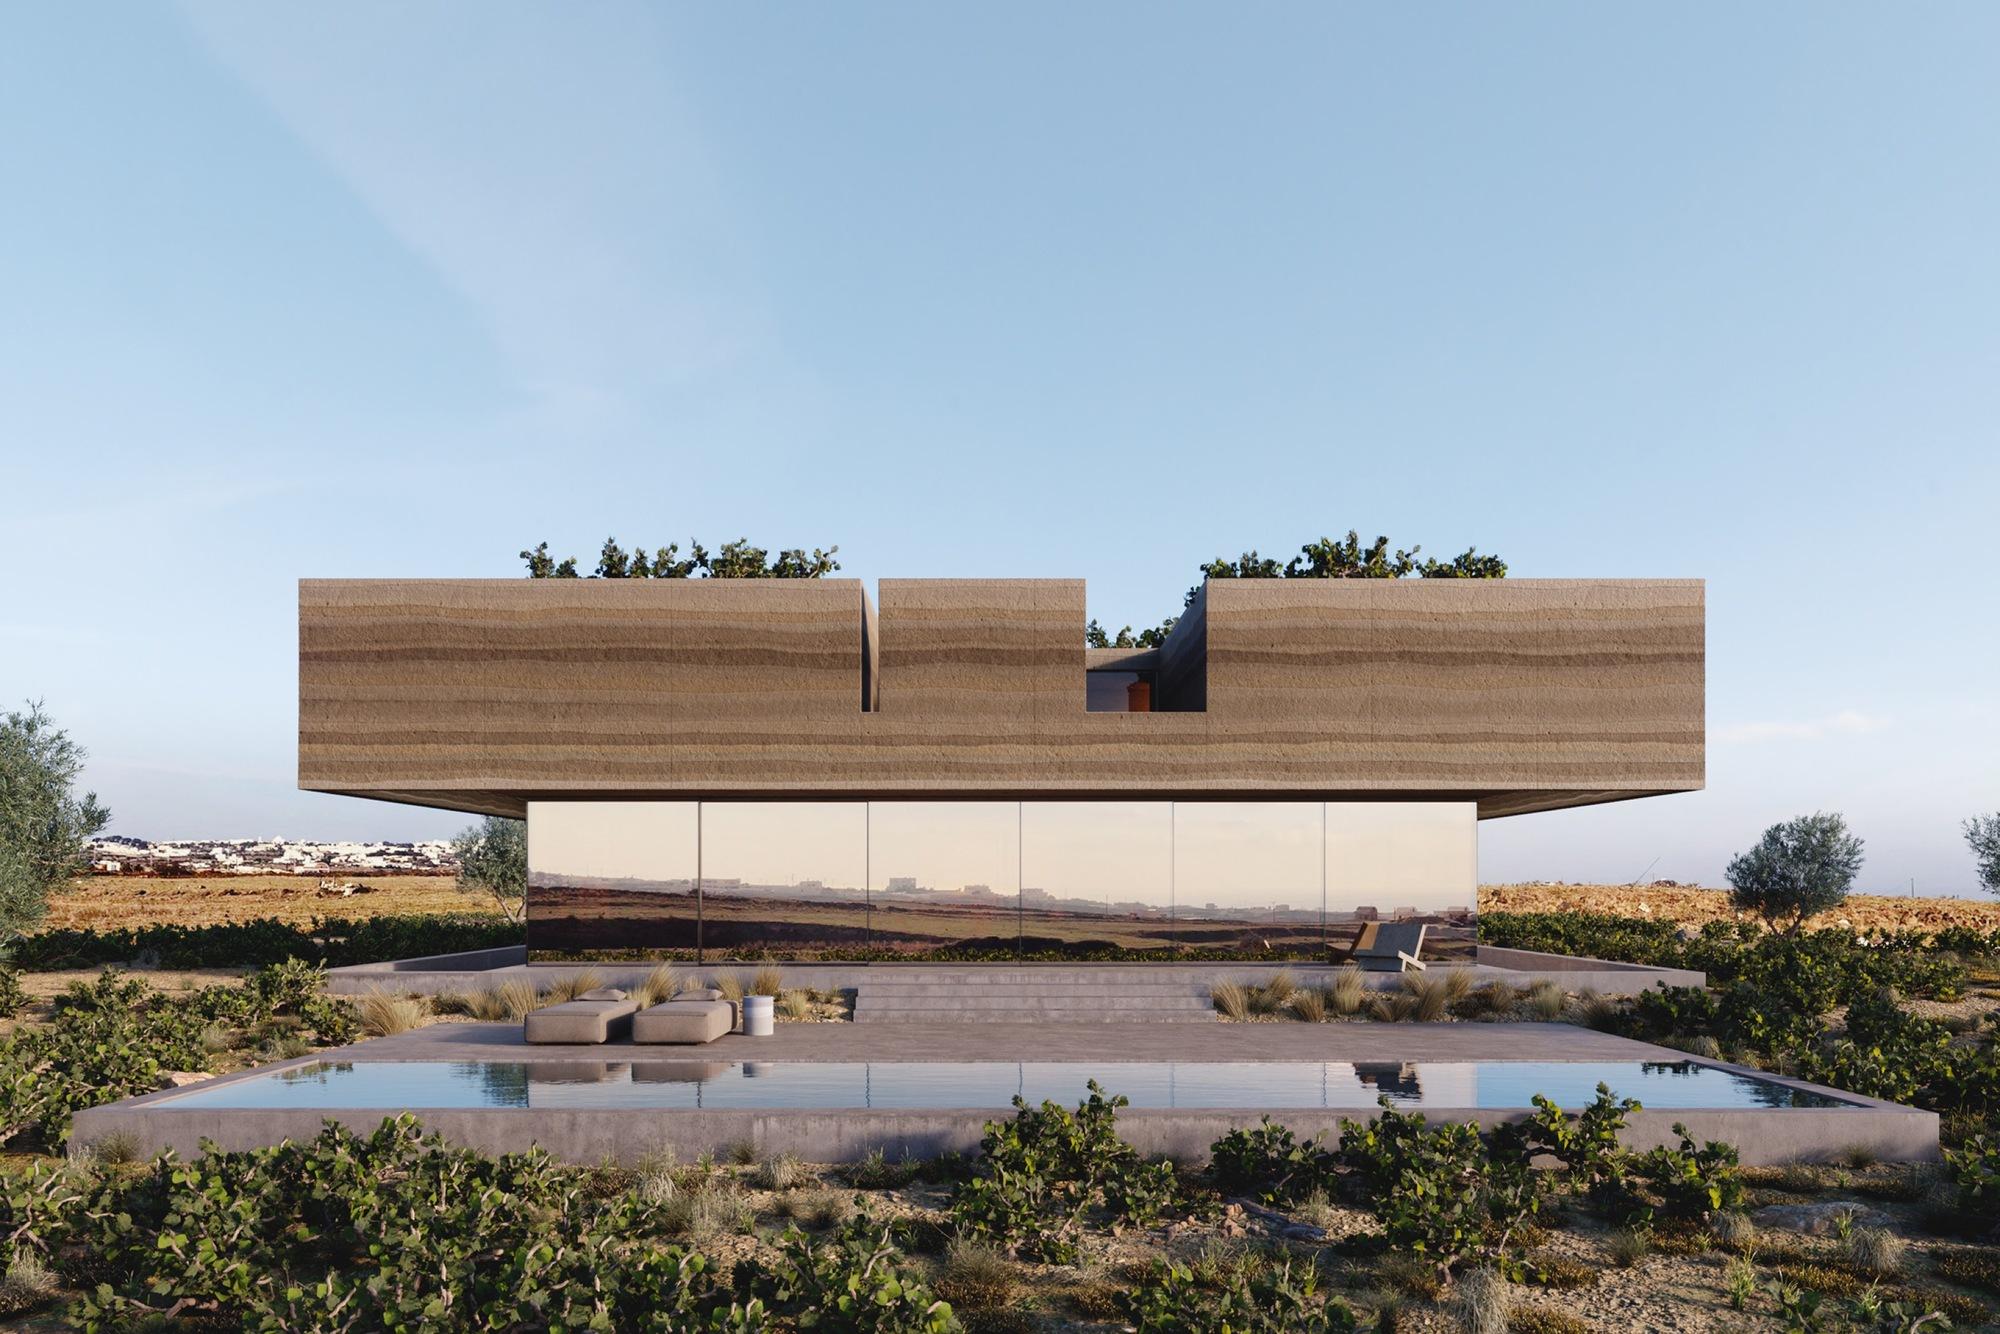 Kapsimalis Architects Carve Land from Santorini Vineyard to Create Floating House